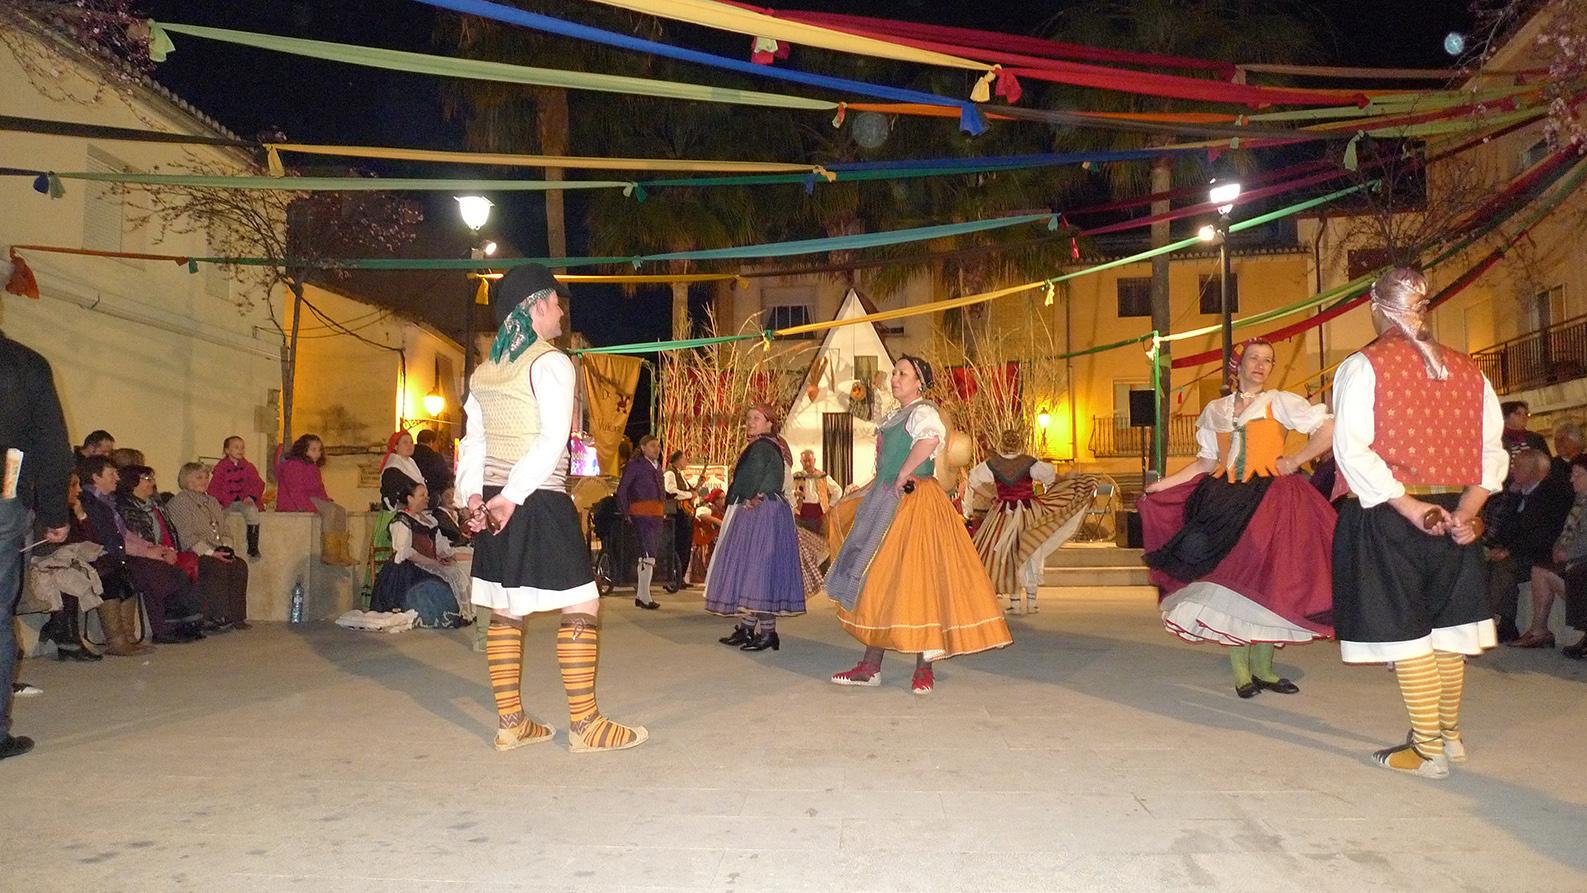 2014-02-23 - Baladre a Fira St. Marcia-ROTOVA (213)